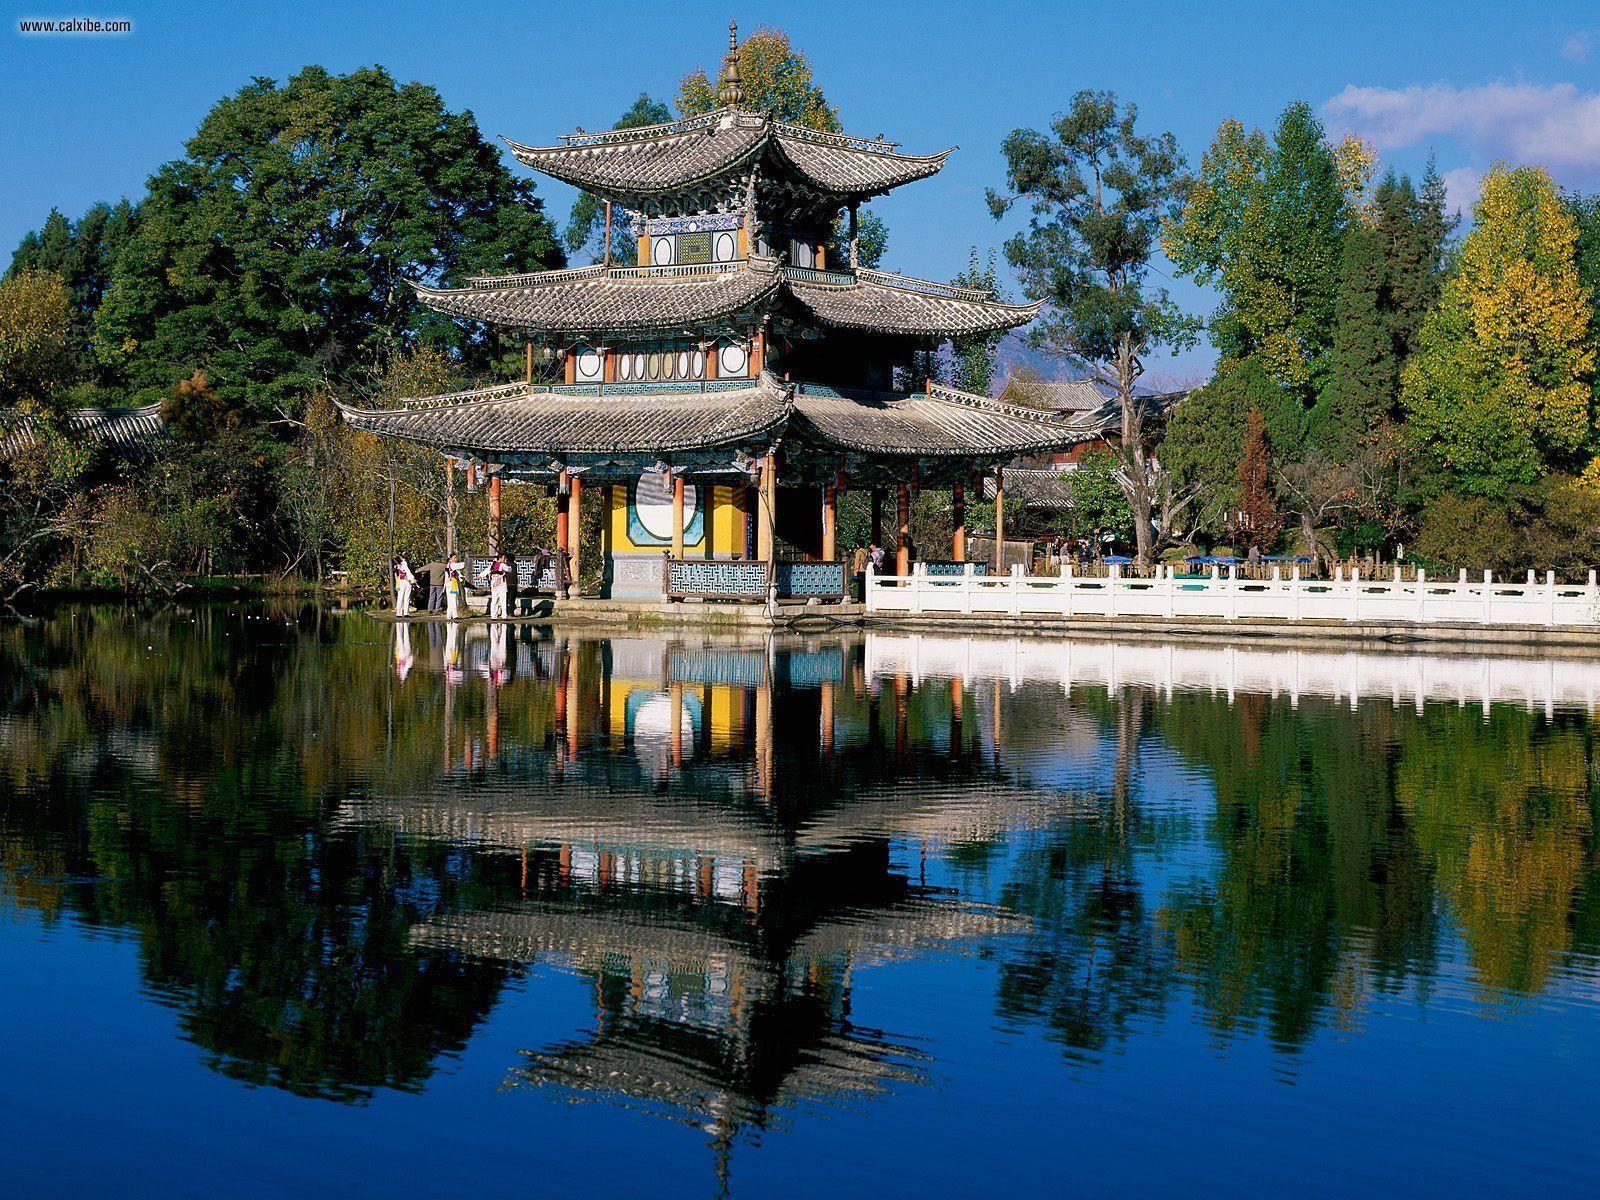 http://3.bp.blogspot.com/_7euhH3K4U-0/TRUIR7WaQqI/AAAAAAAAAEI/fE2d91nSs0s/s1600/Deyue_Pavilion_Black_Dragon_Pool_Park_Beijing_China.jpg